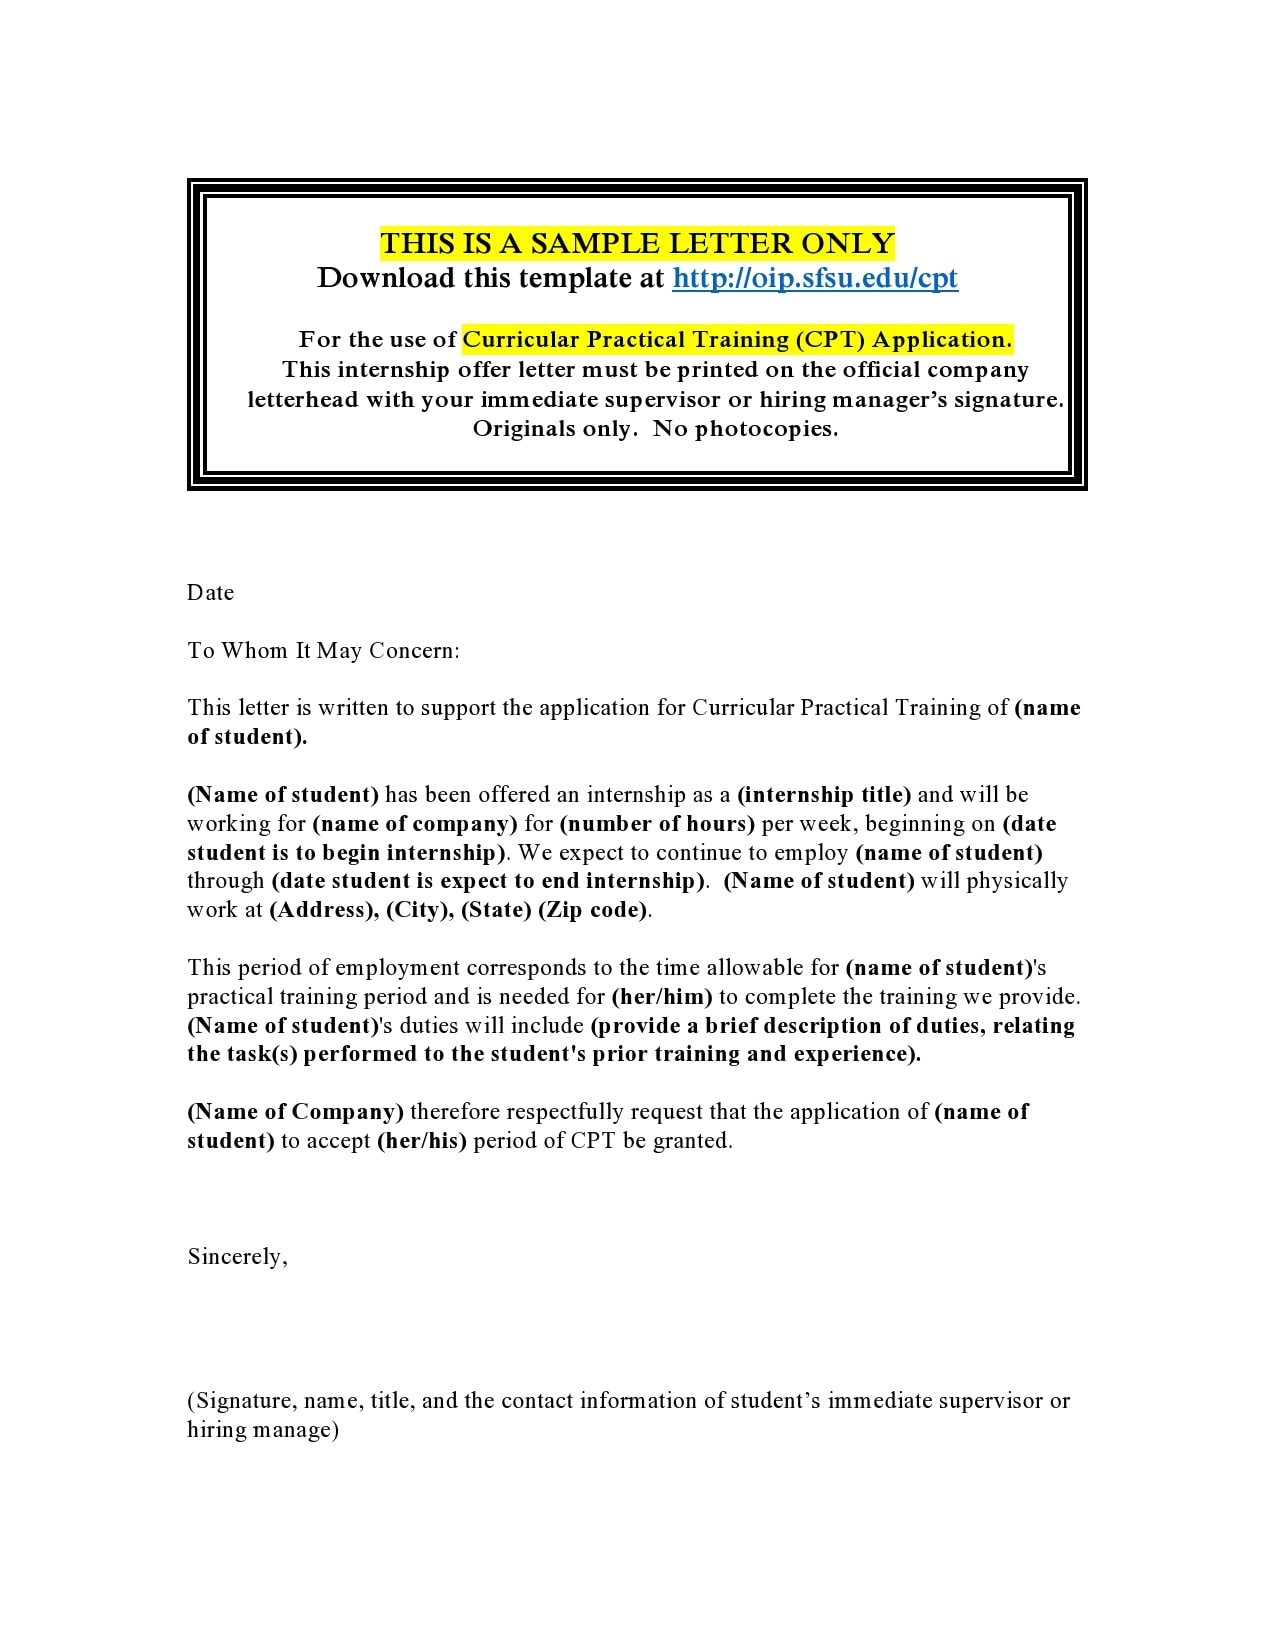 internship offer letter 22